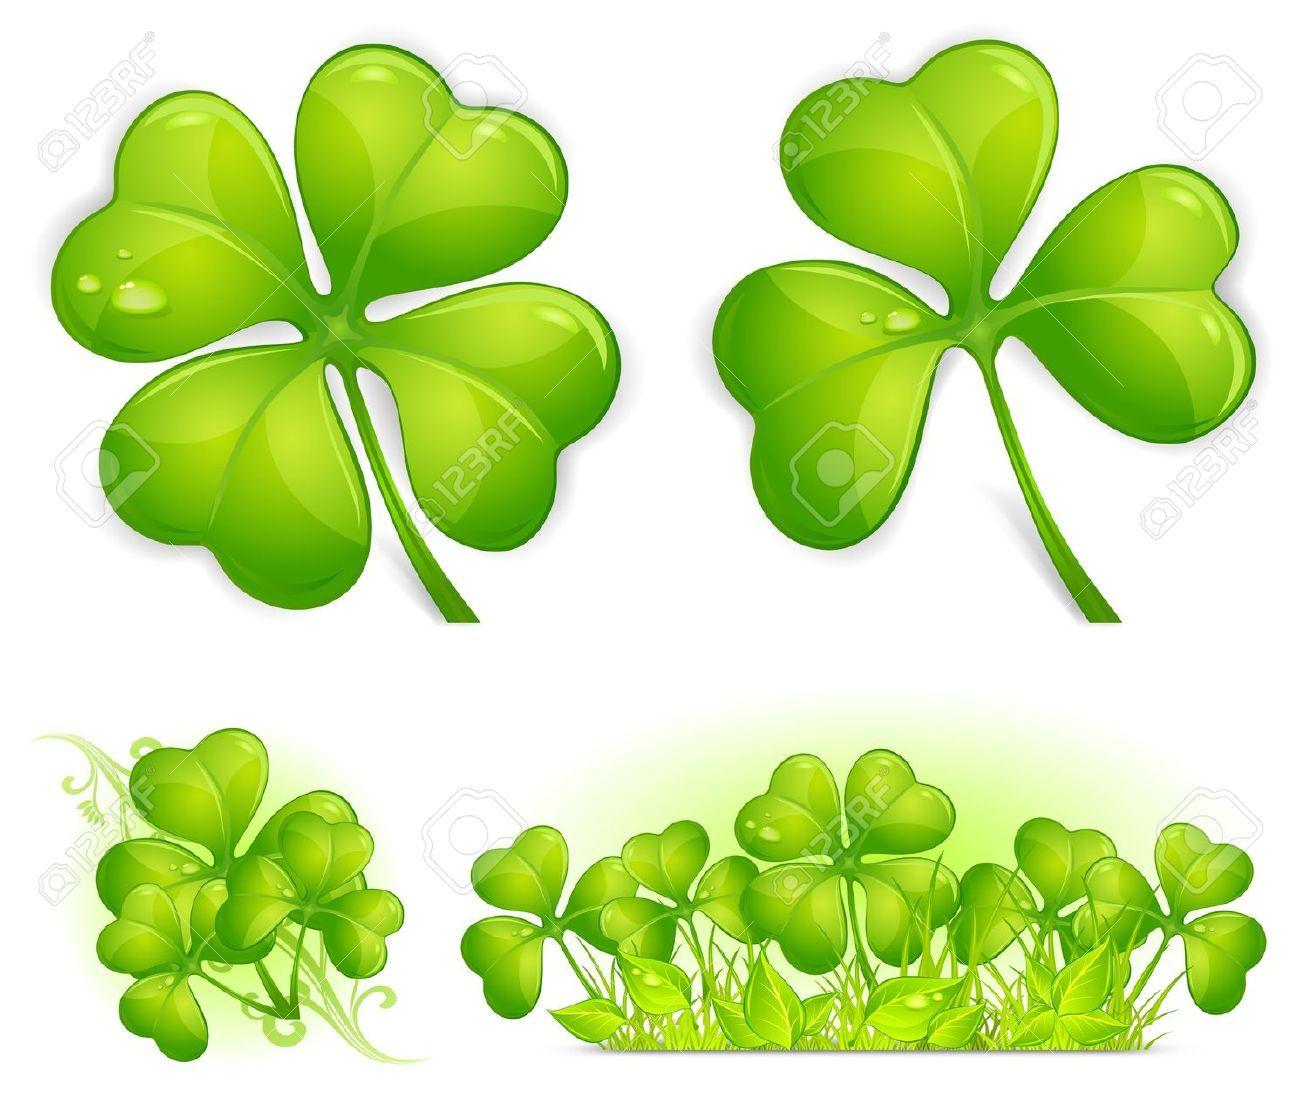 trebol irlandes dibujo - Buscar con Google | tréboles | Pinterest ...